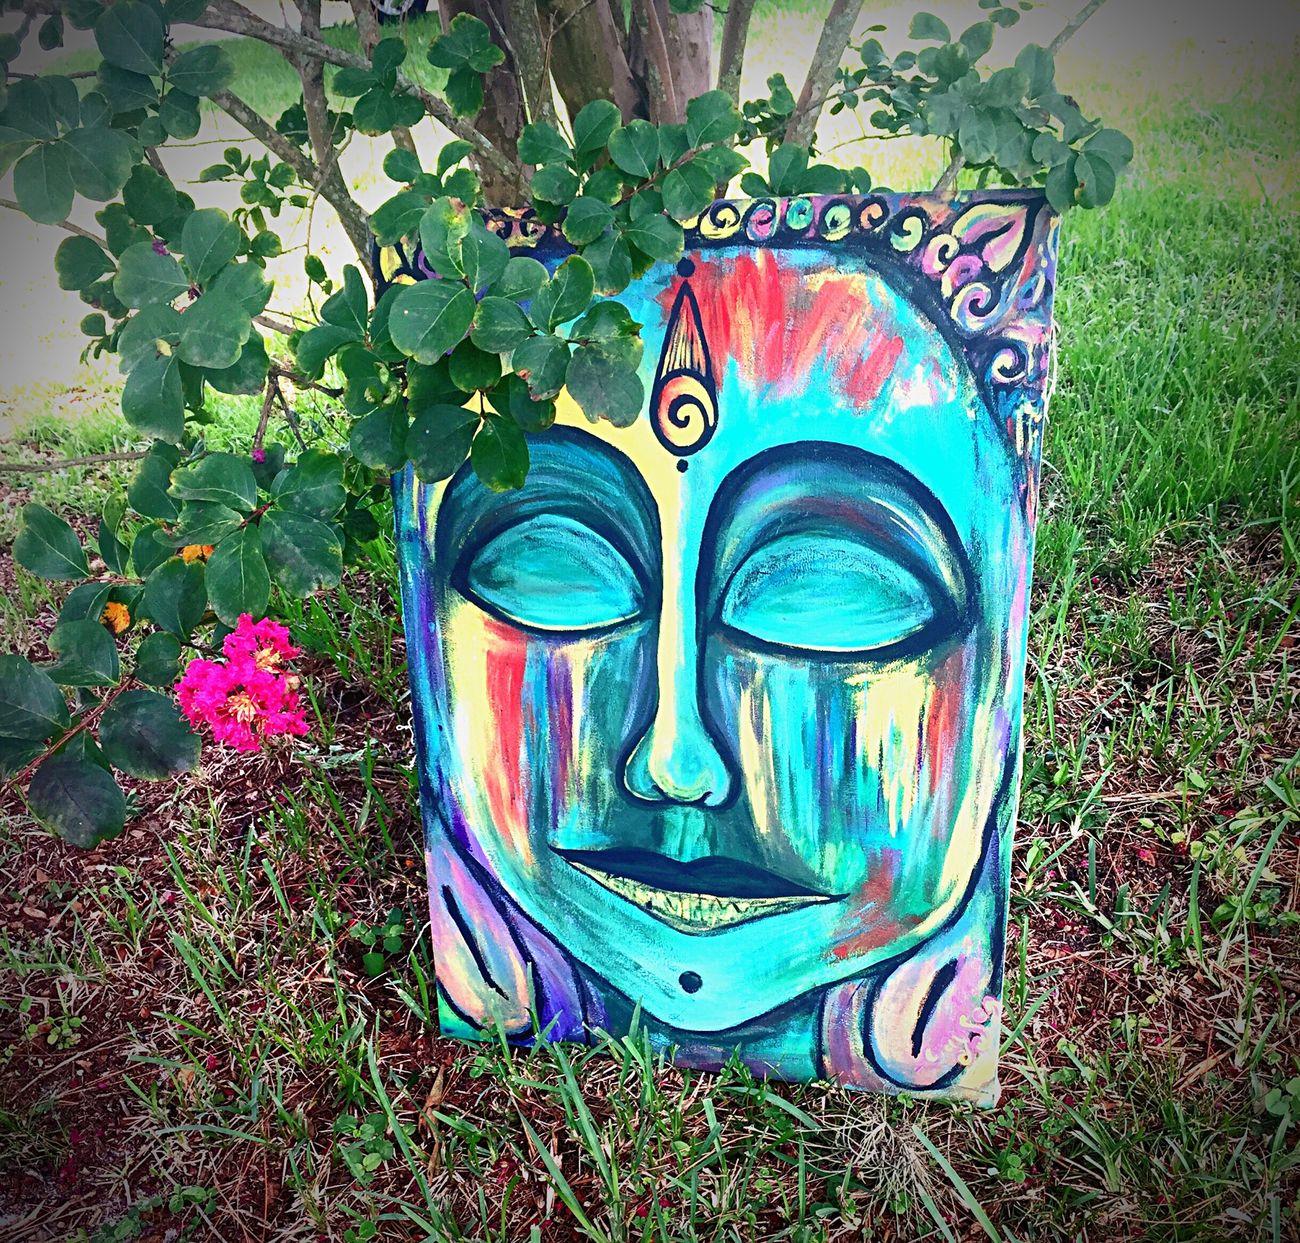 Doghairstudio Gypsylife Friends ❤ Gifted Art Buddha Art Is Life